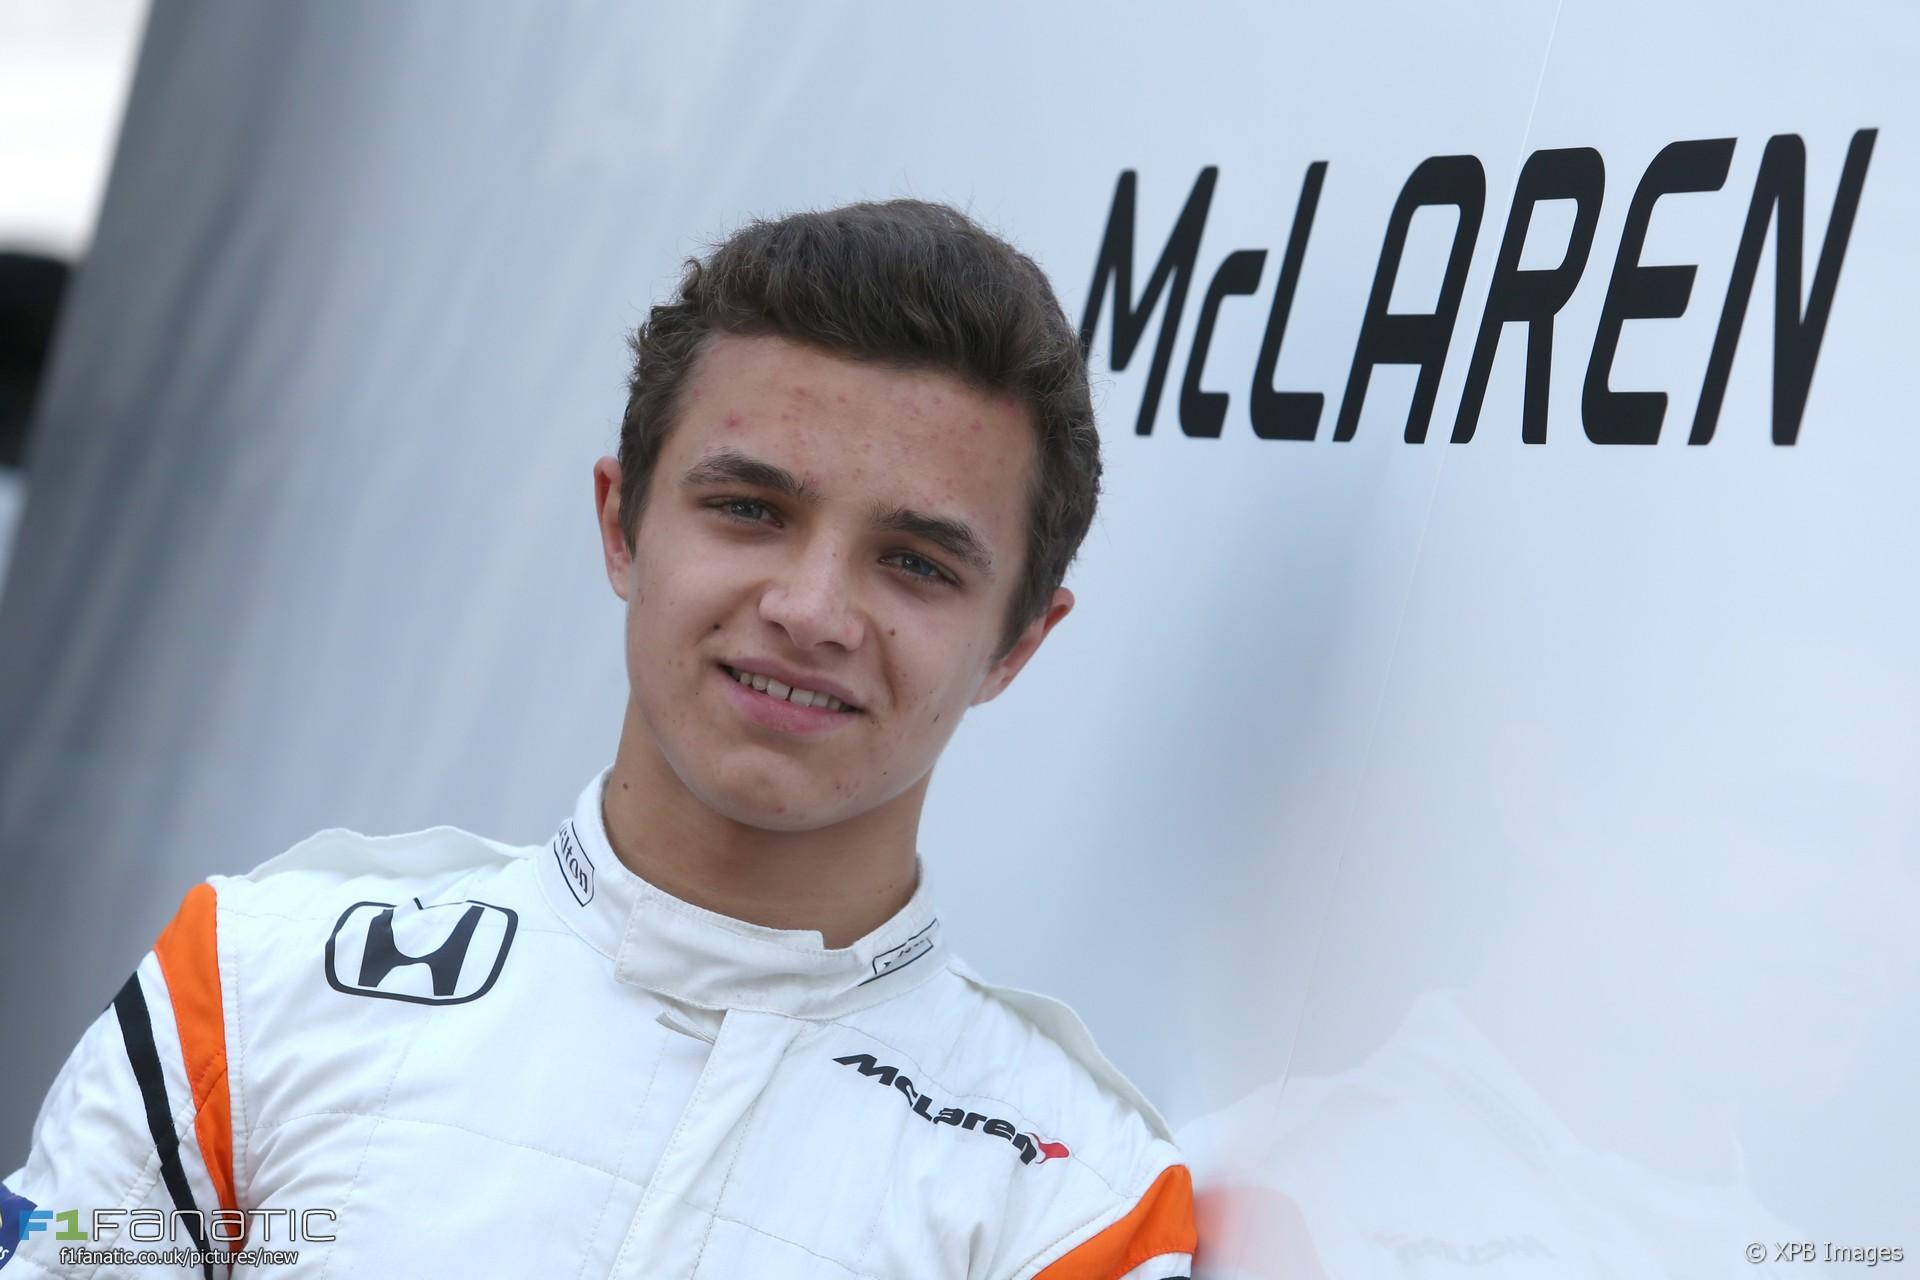 Lando Norris, McLaren, Hungaroring, 2017